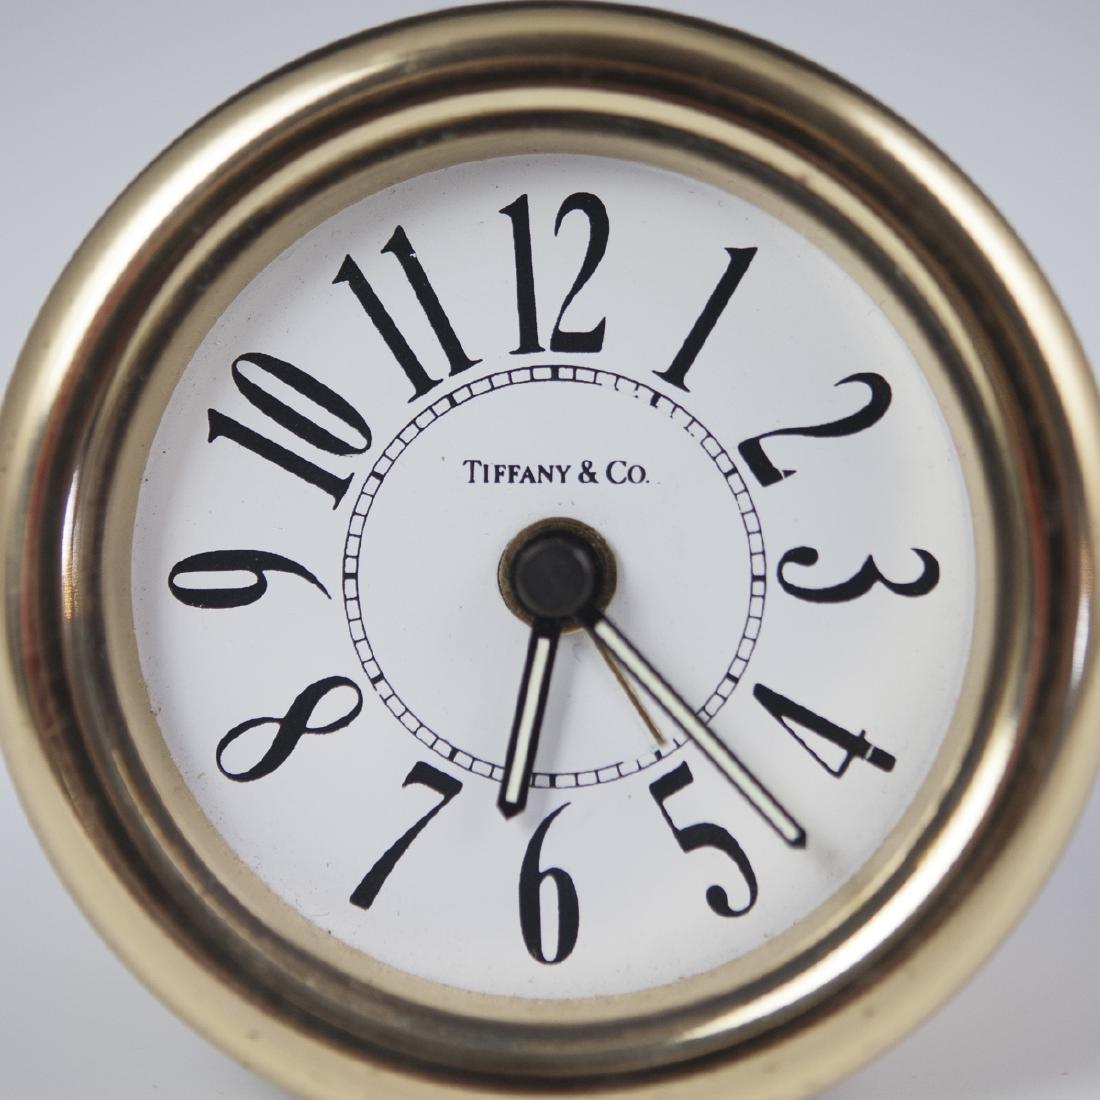 Tiffany & Co. Brass Desk Clock - 2